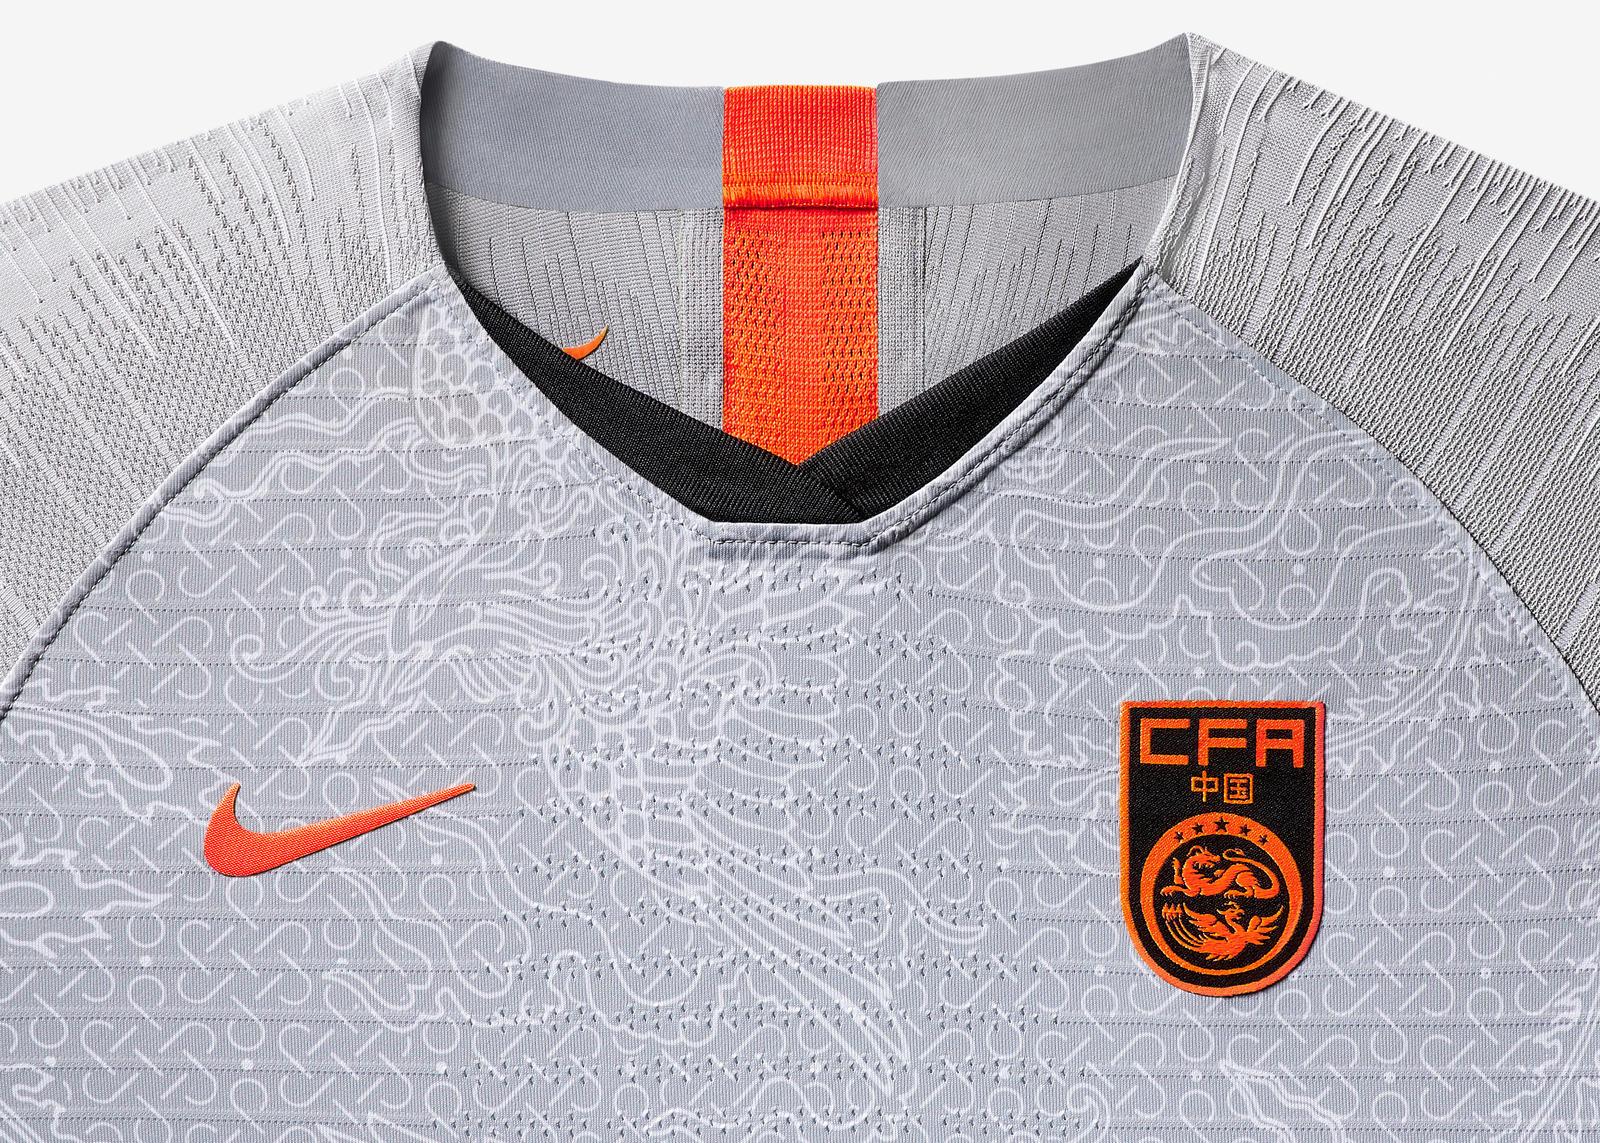 China 2019 Women's Football Kit - Nike News